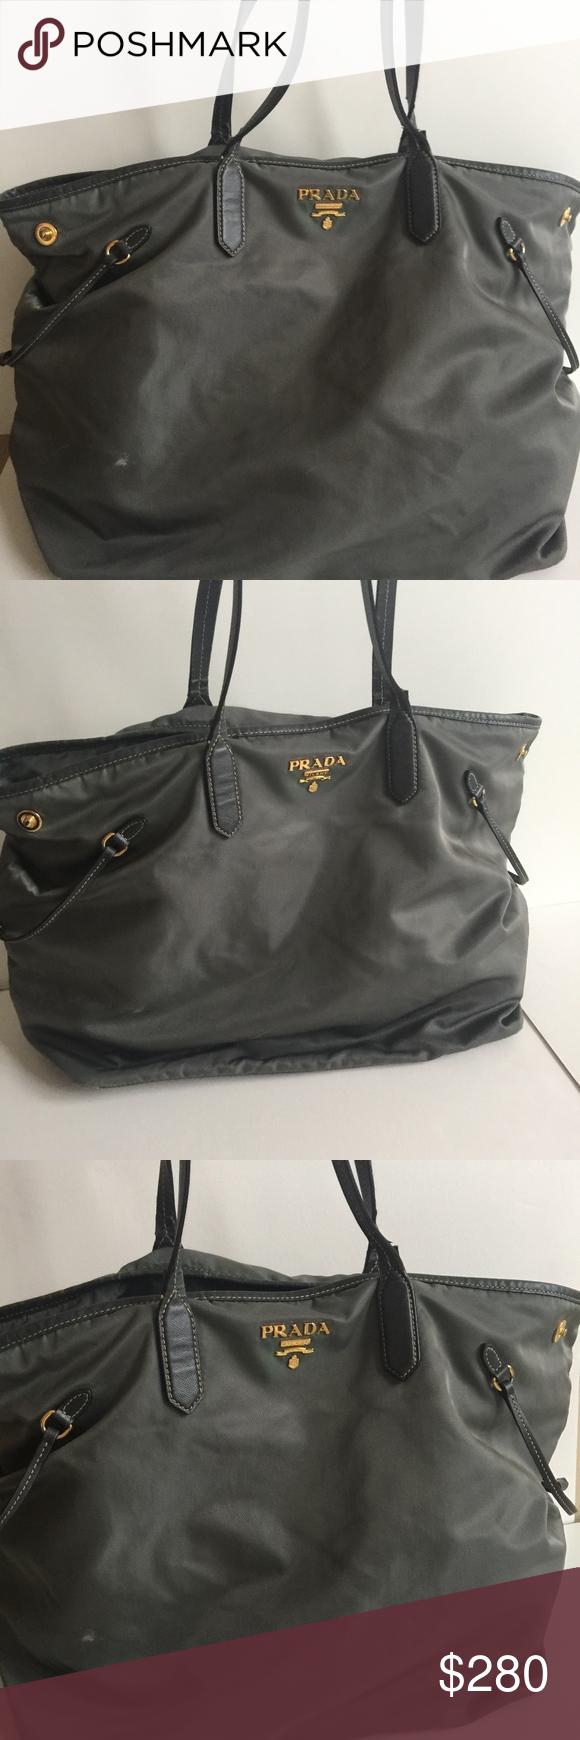 9c473fb20385 ... discount prada taupe leather trim and nylon shoulder bag authentic prada  nylon tote bag with leather